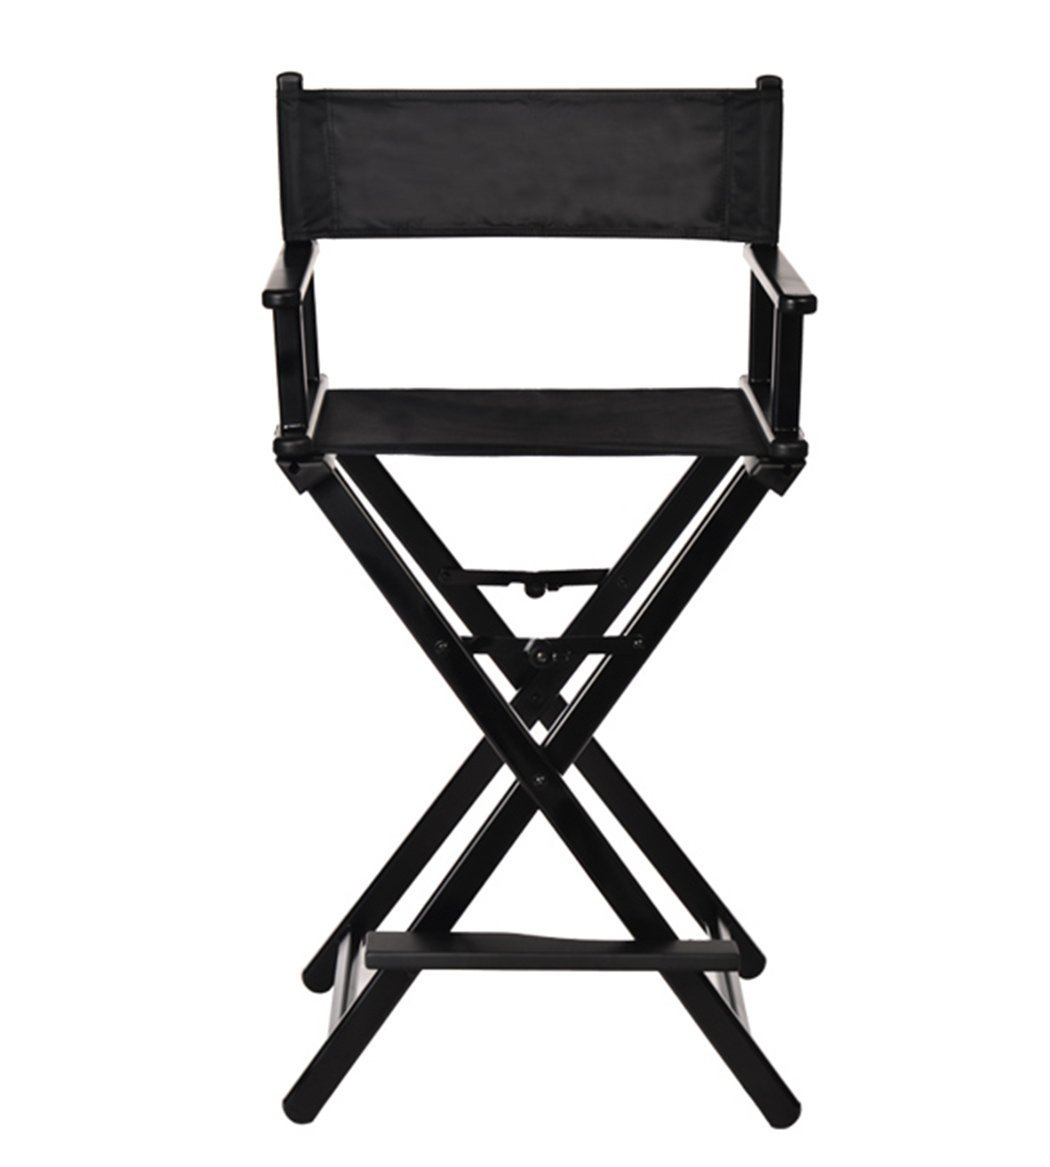 Gracelove Aluminum Frame Makeup Artist Director's Chair Foldable Professional